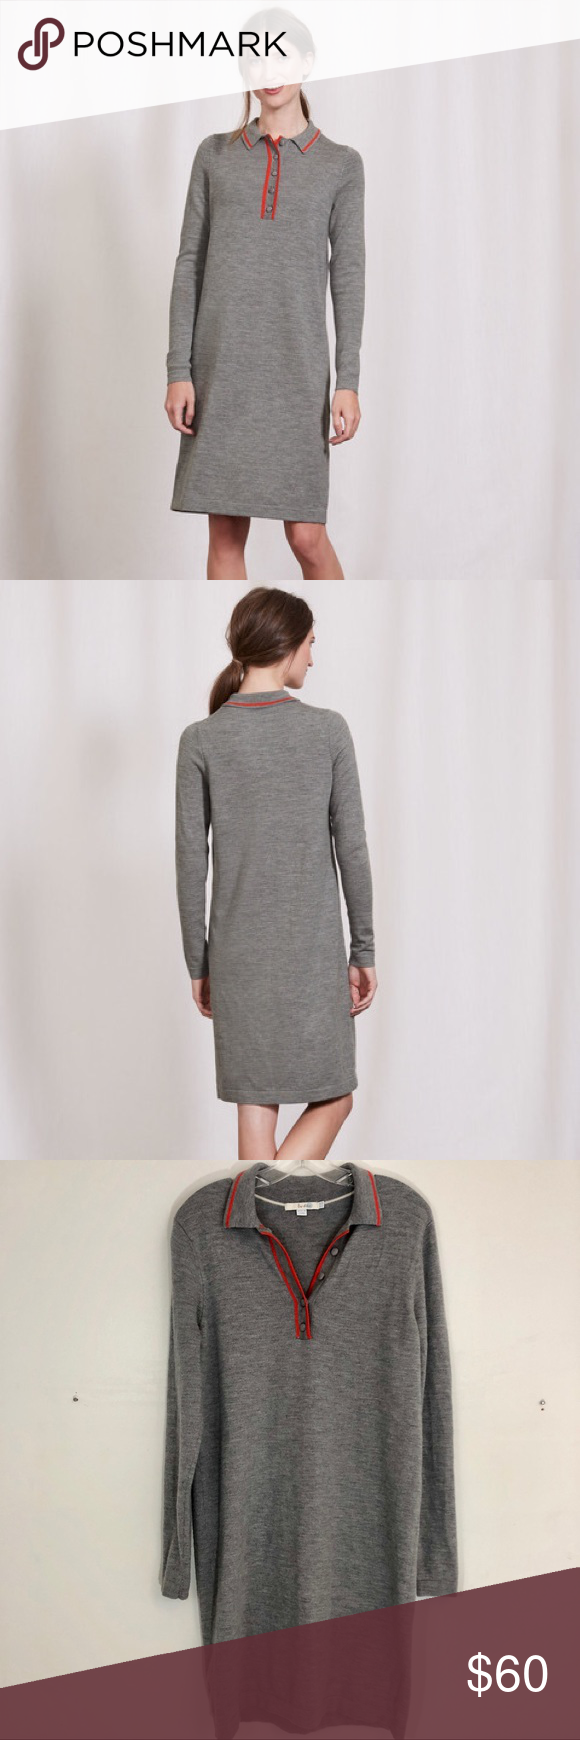 Boden Sweater Dress Ladies Size 10R